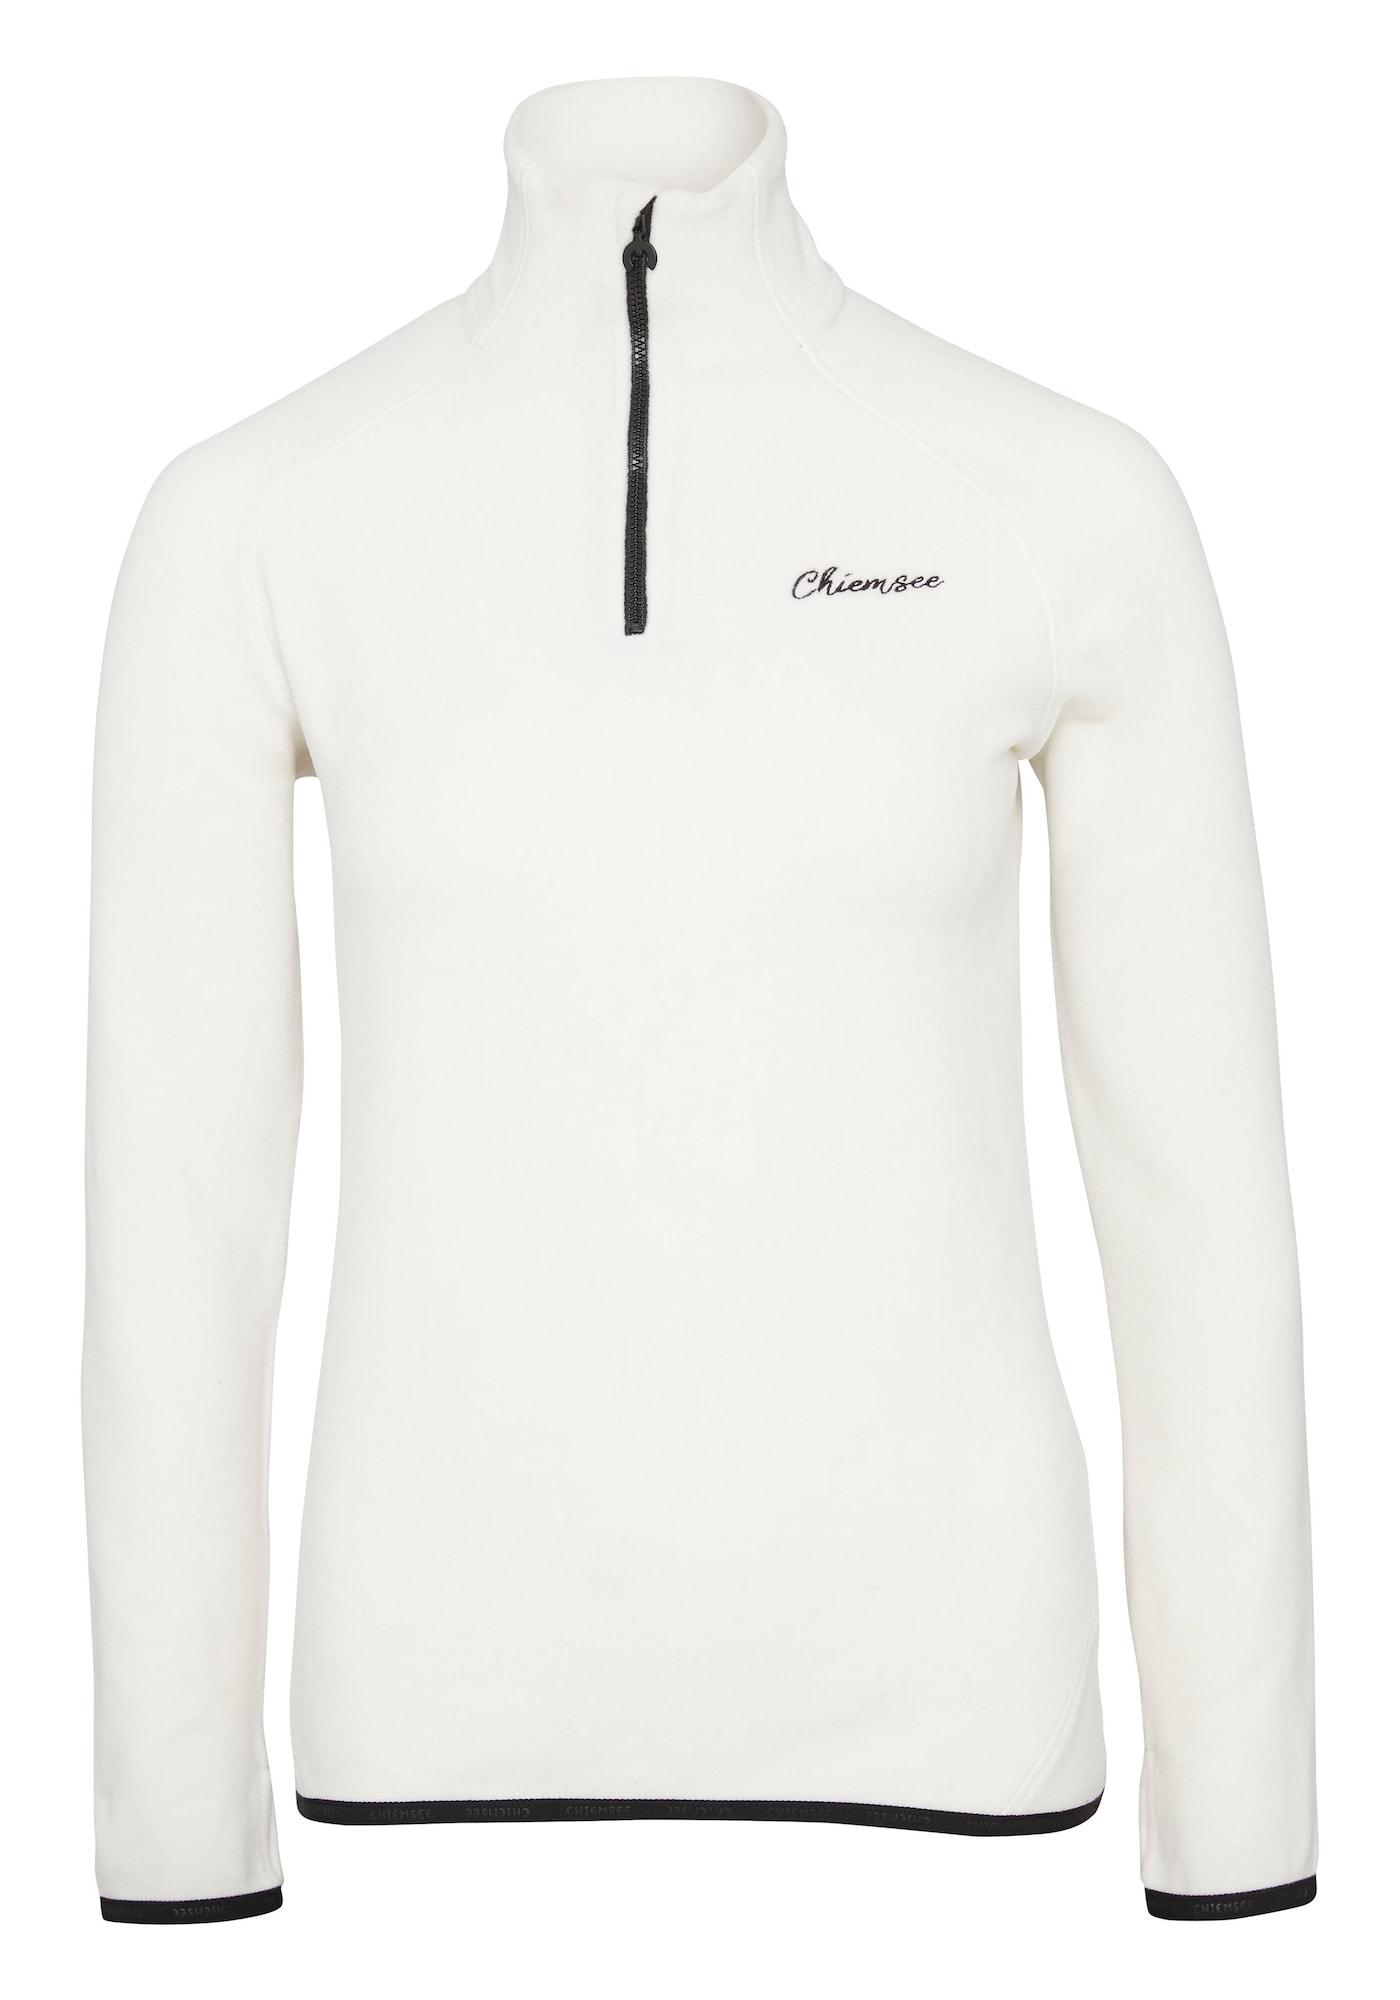 Fleeceshirt 'HEIKE Sweatshirt'   Bekleidung > Sweatshirts & -jacken > Fleeceshirts   Chiemsee